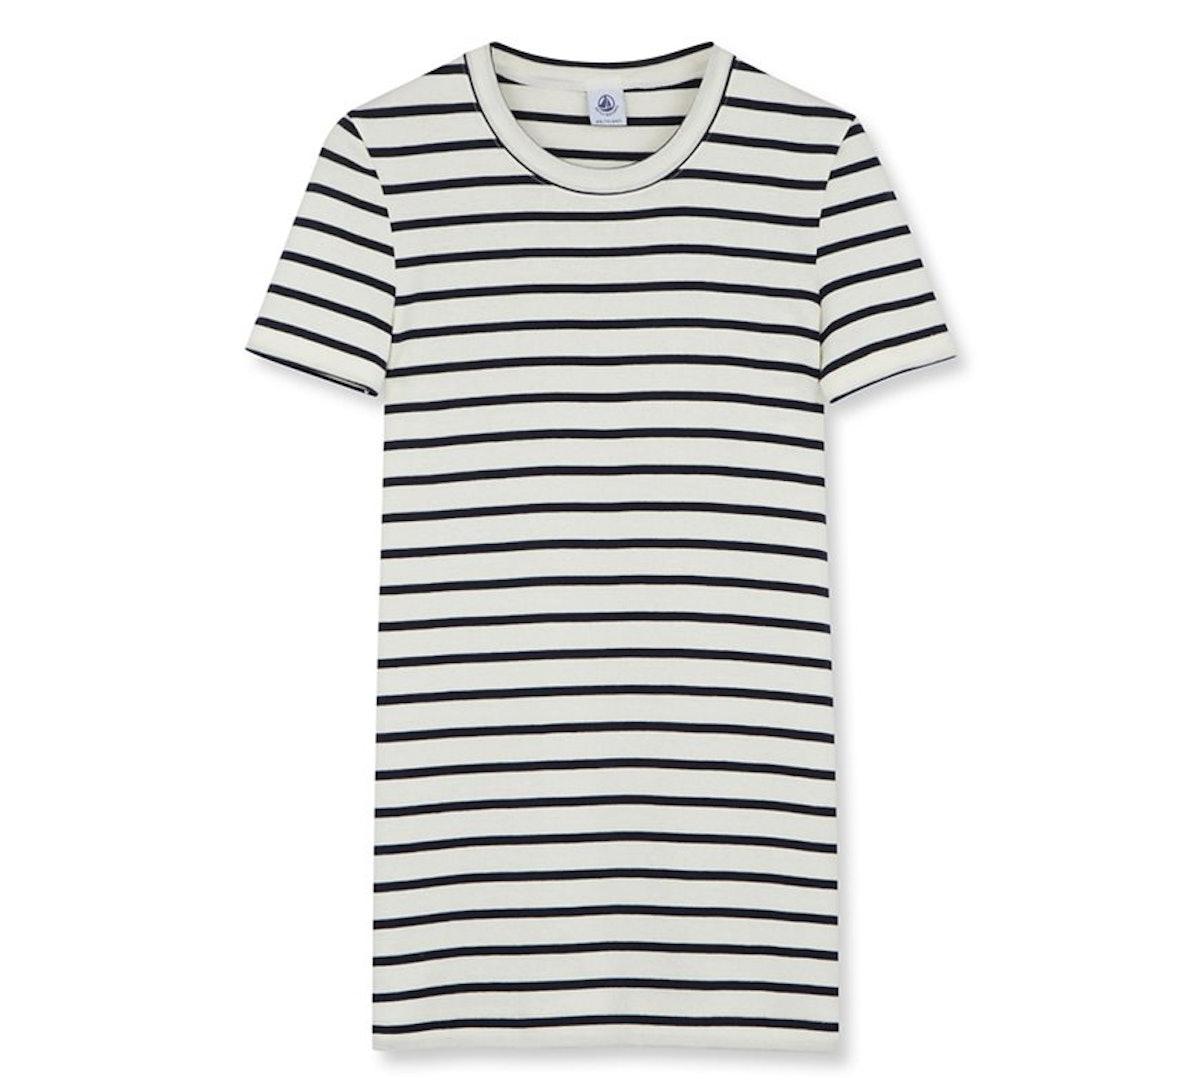 Petit Bateau Women's Iconic Cotton Striped T-Shirt